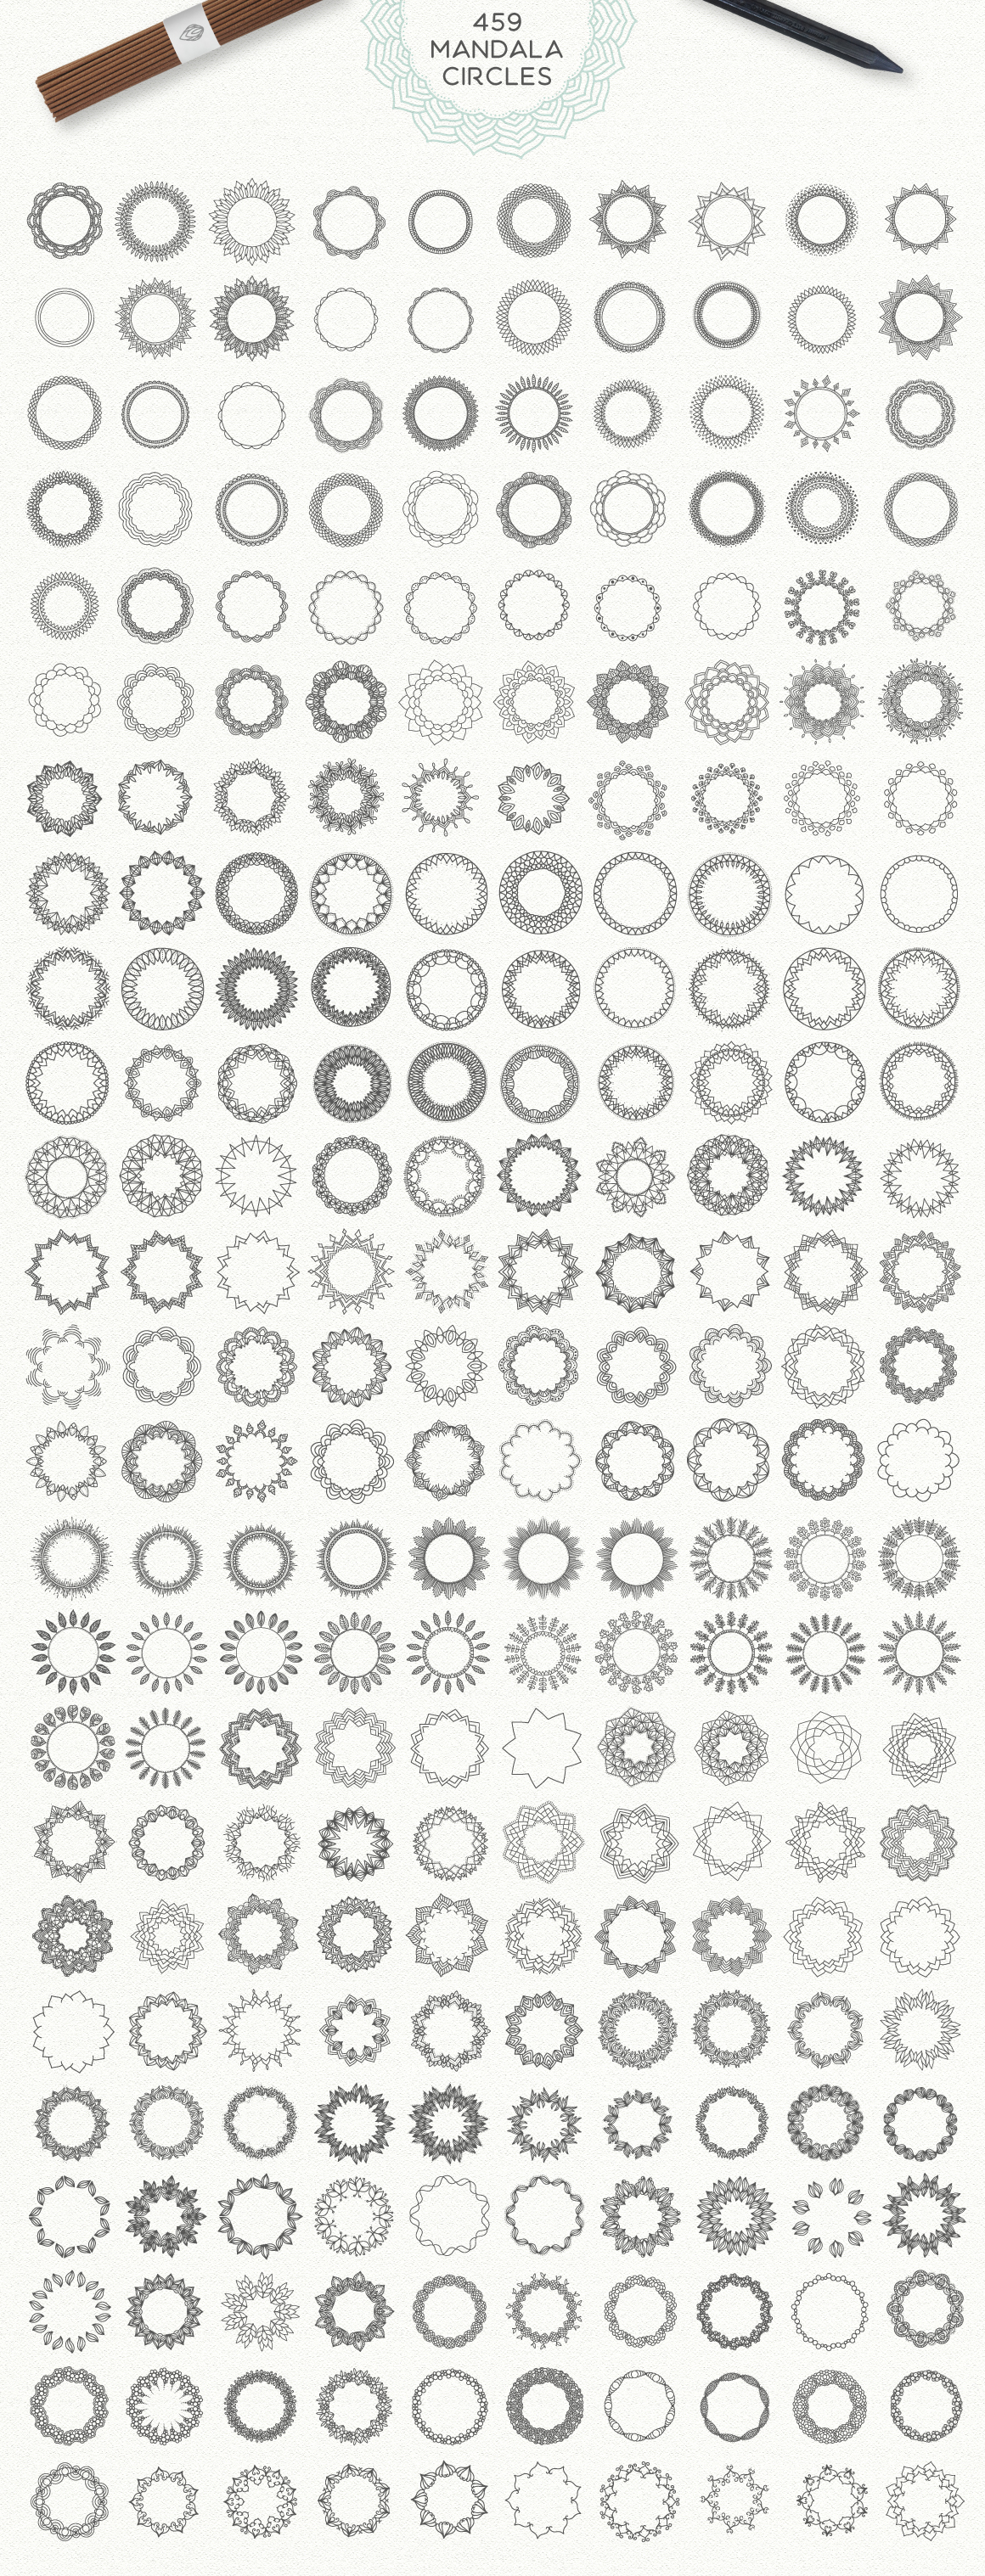 Mandala Collection [630 Elements] example image 3